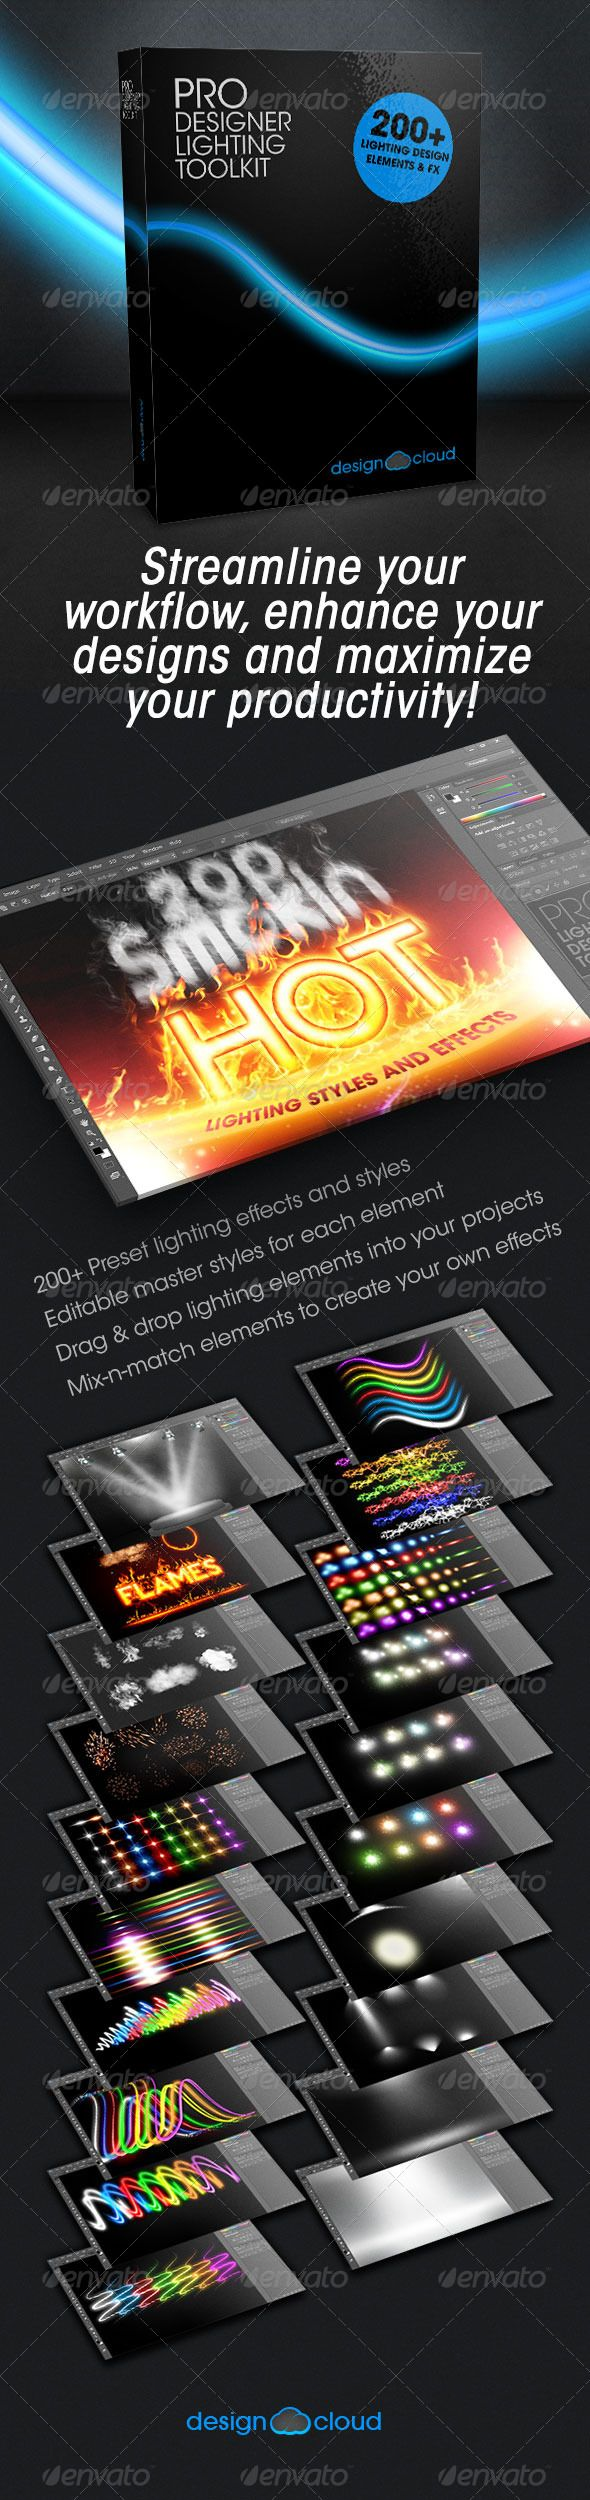 Poster design top 10 - Pro Lighting Designer Toolkit